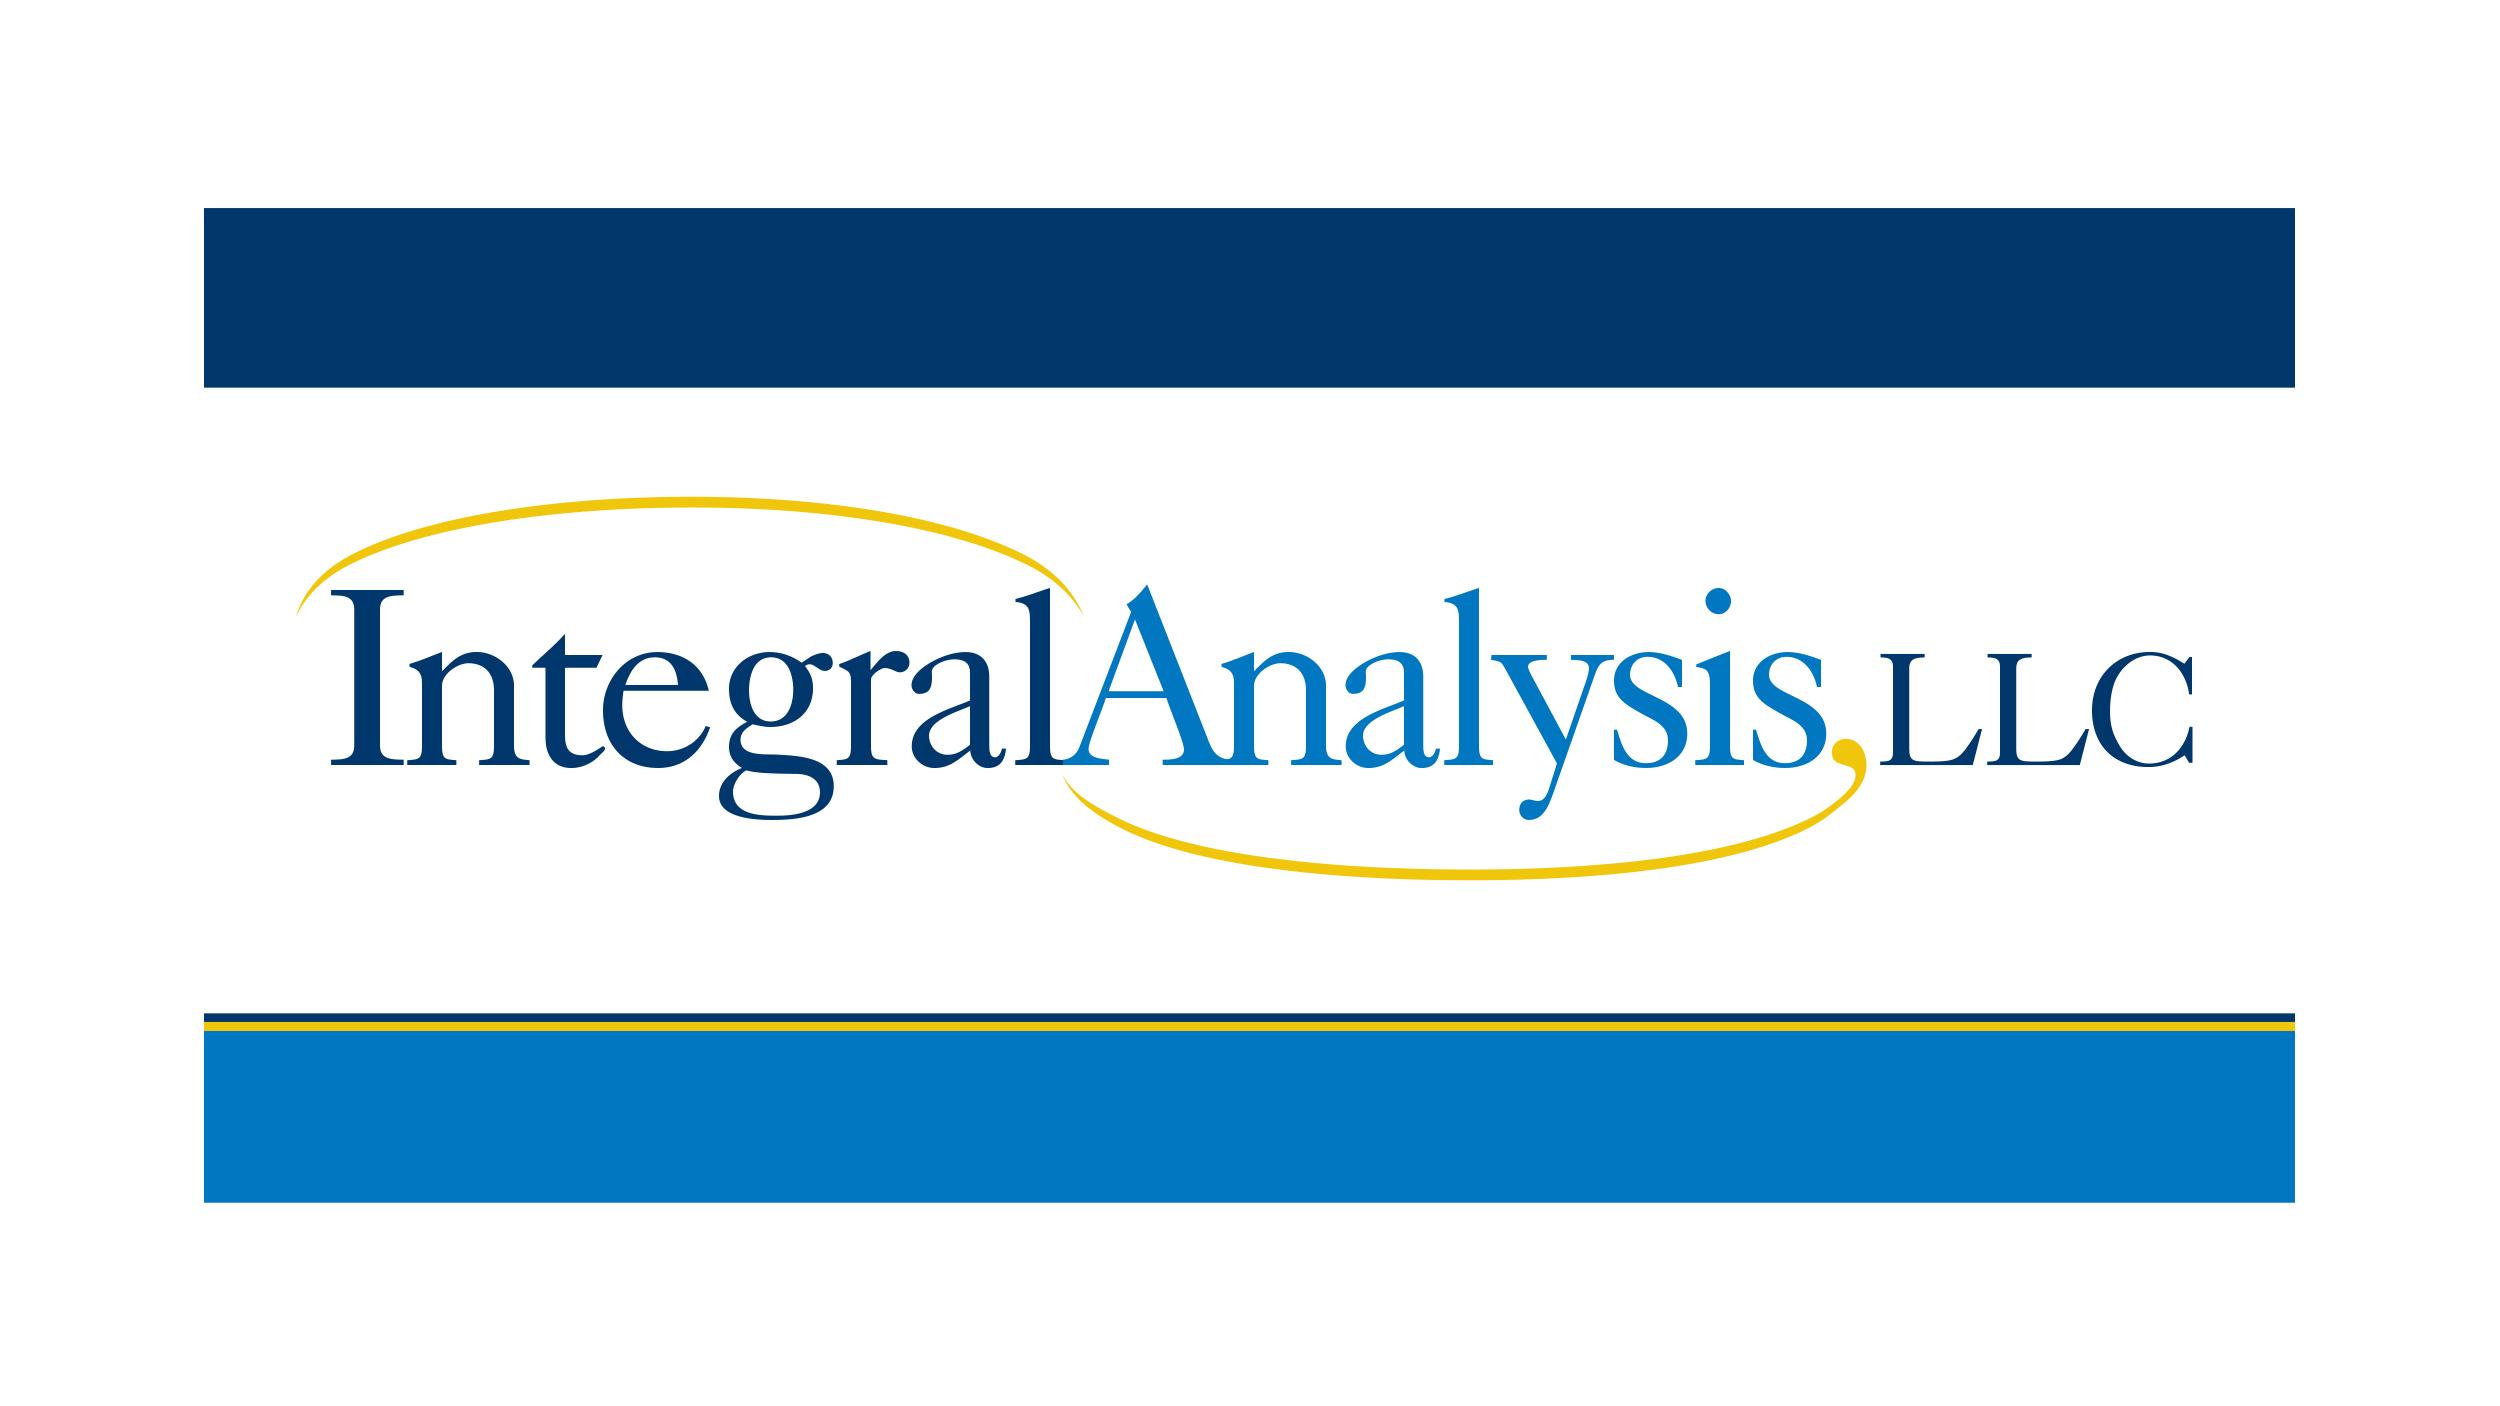 Integral-Analysis-LLC-Logos-Brand-Identity.jpg